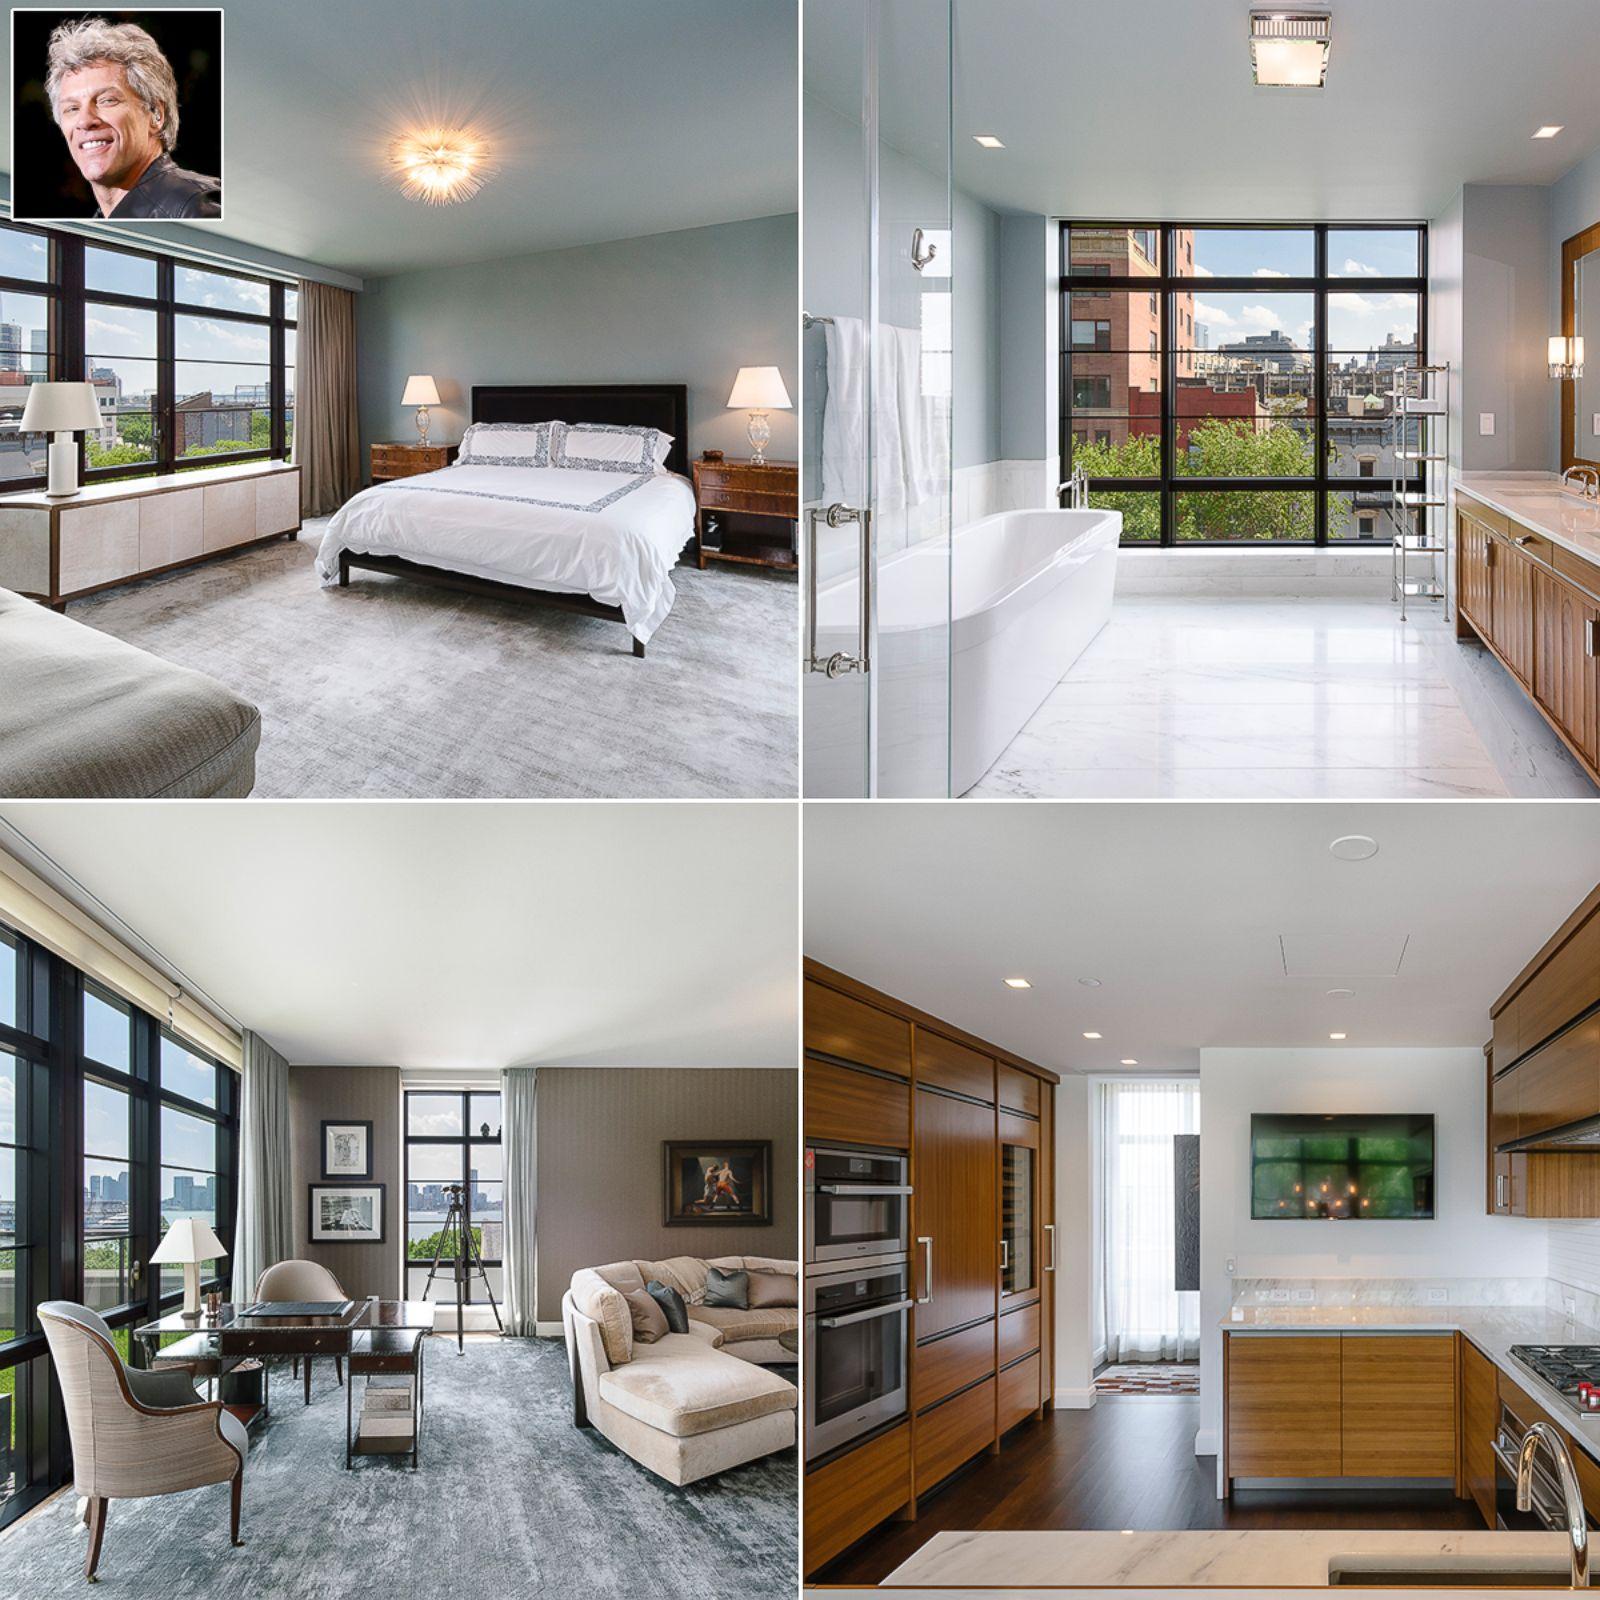 In photos: Celebrity homes Photos - ABC News